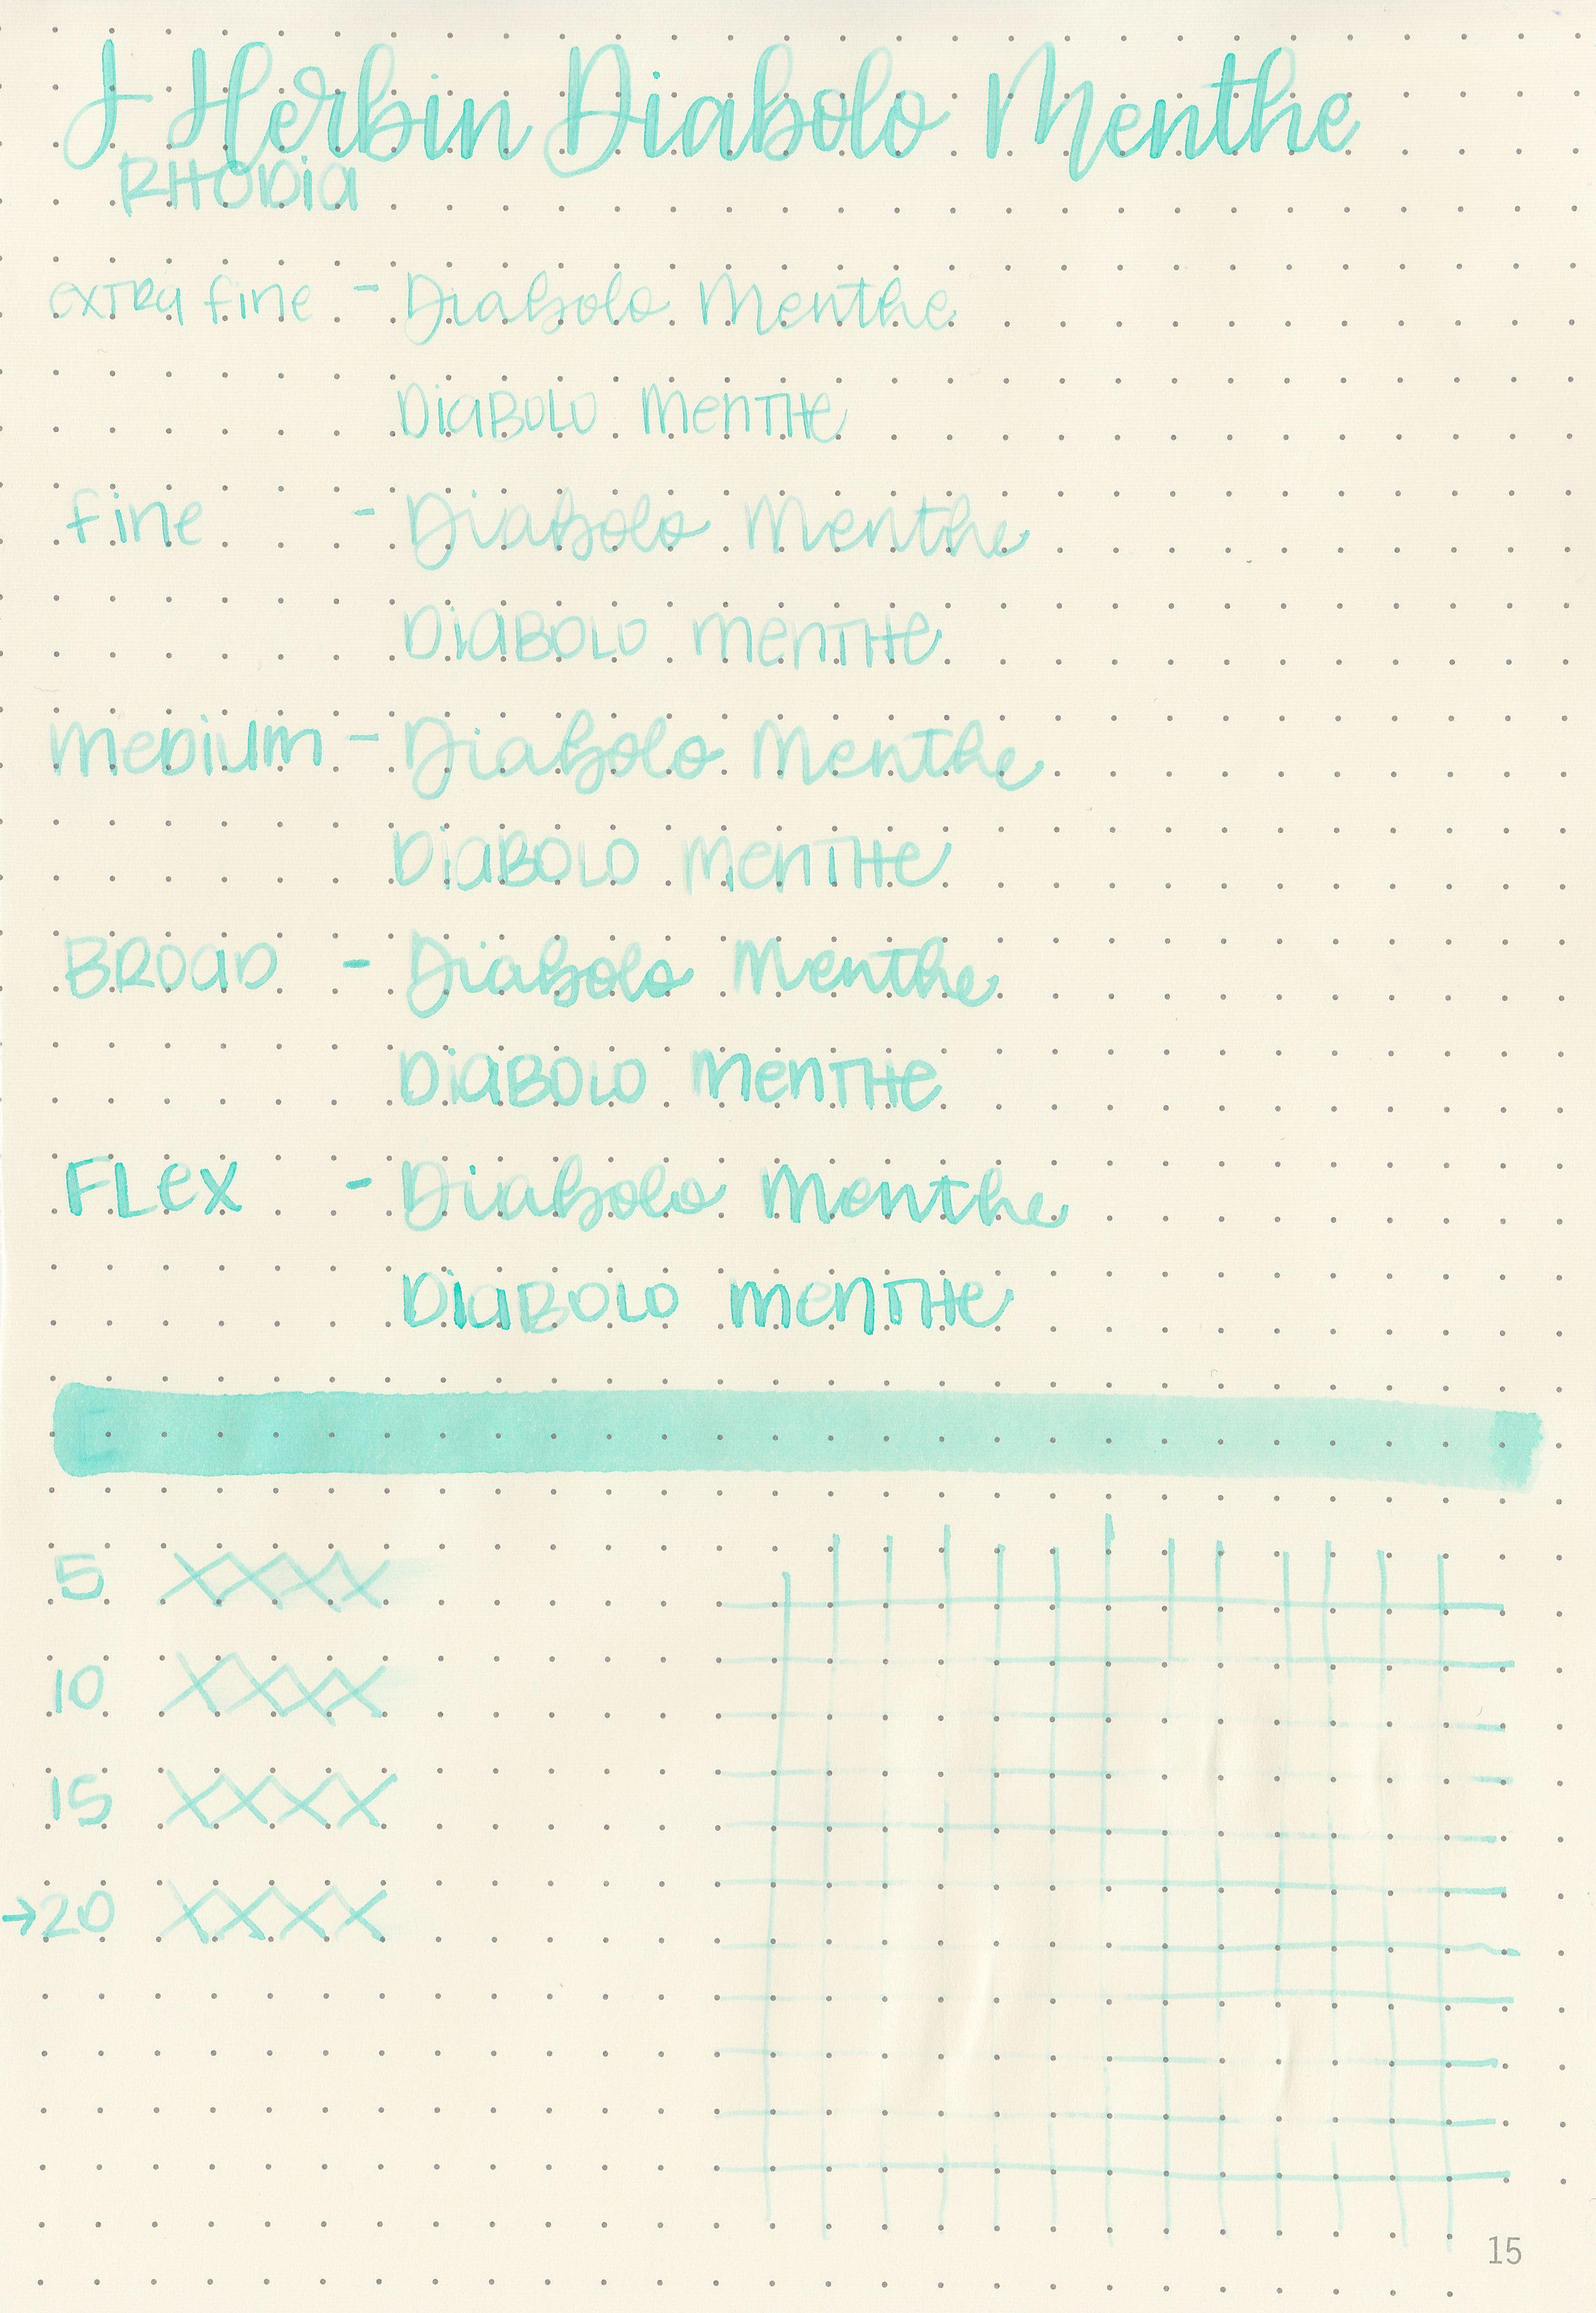 jh-diabolo-menthe-5.jpg